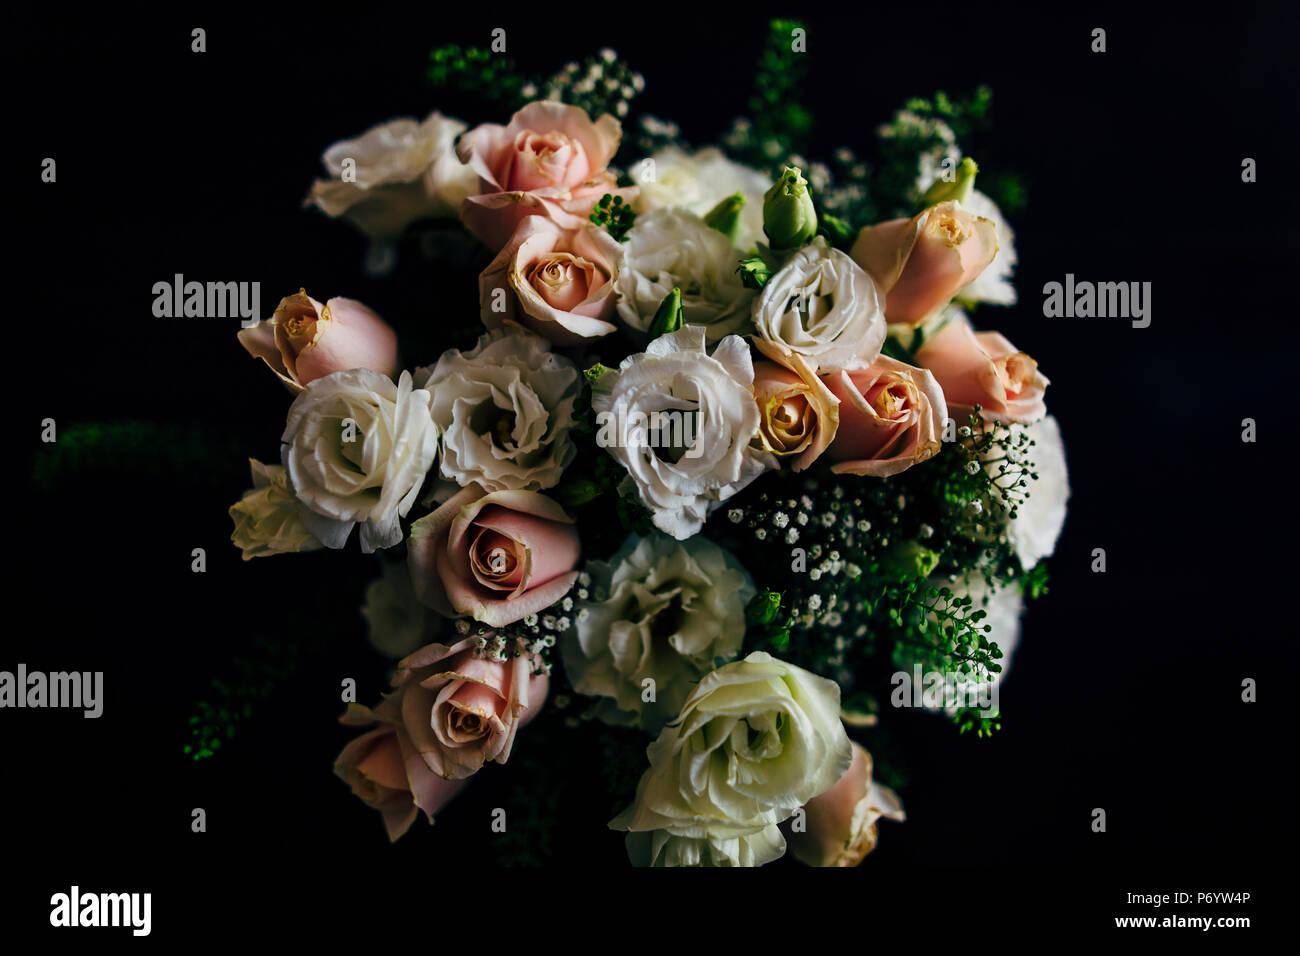 Wedding Bouquet With Fresh Flowers On Dark Background Stock Photo